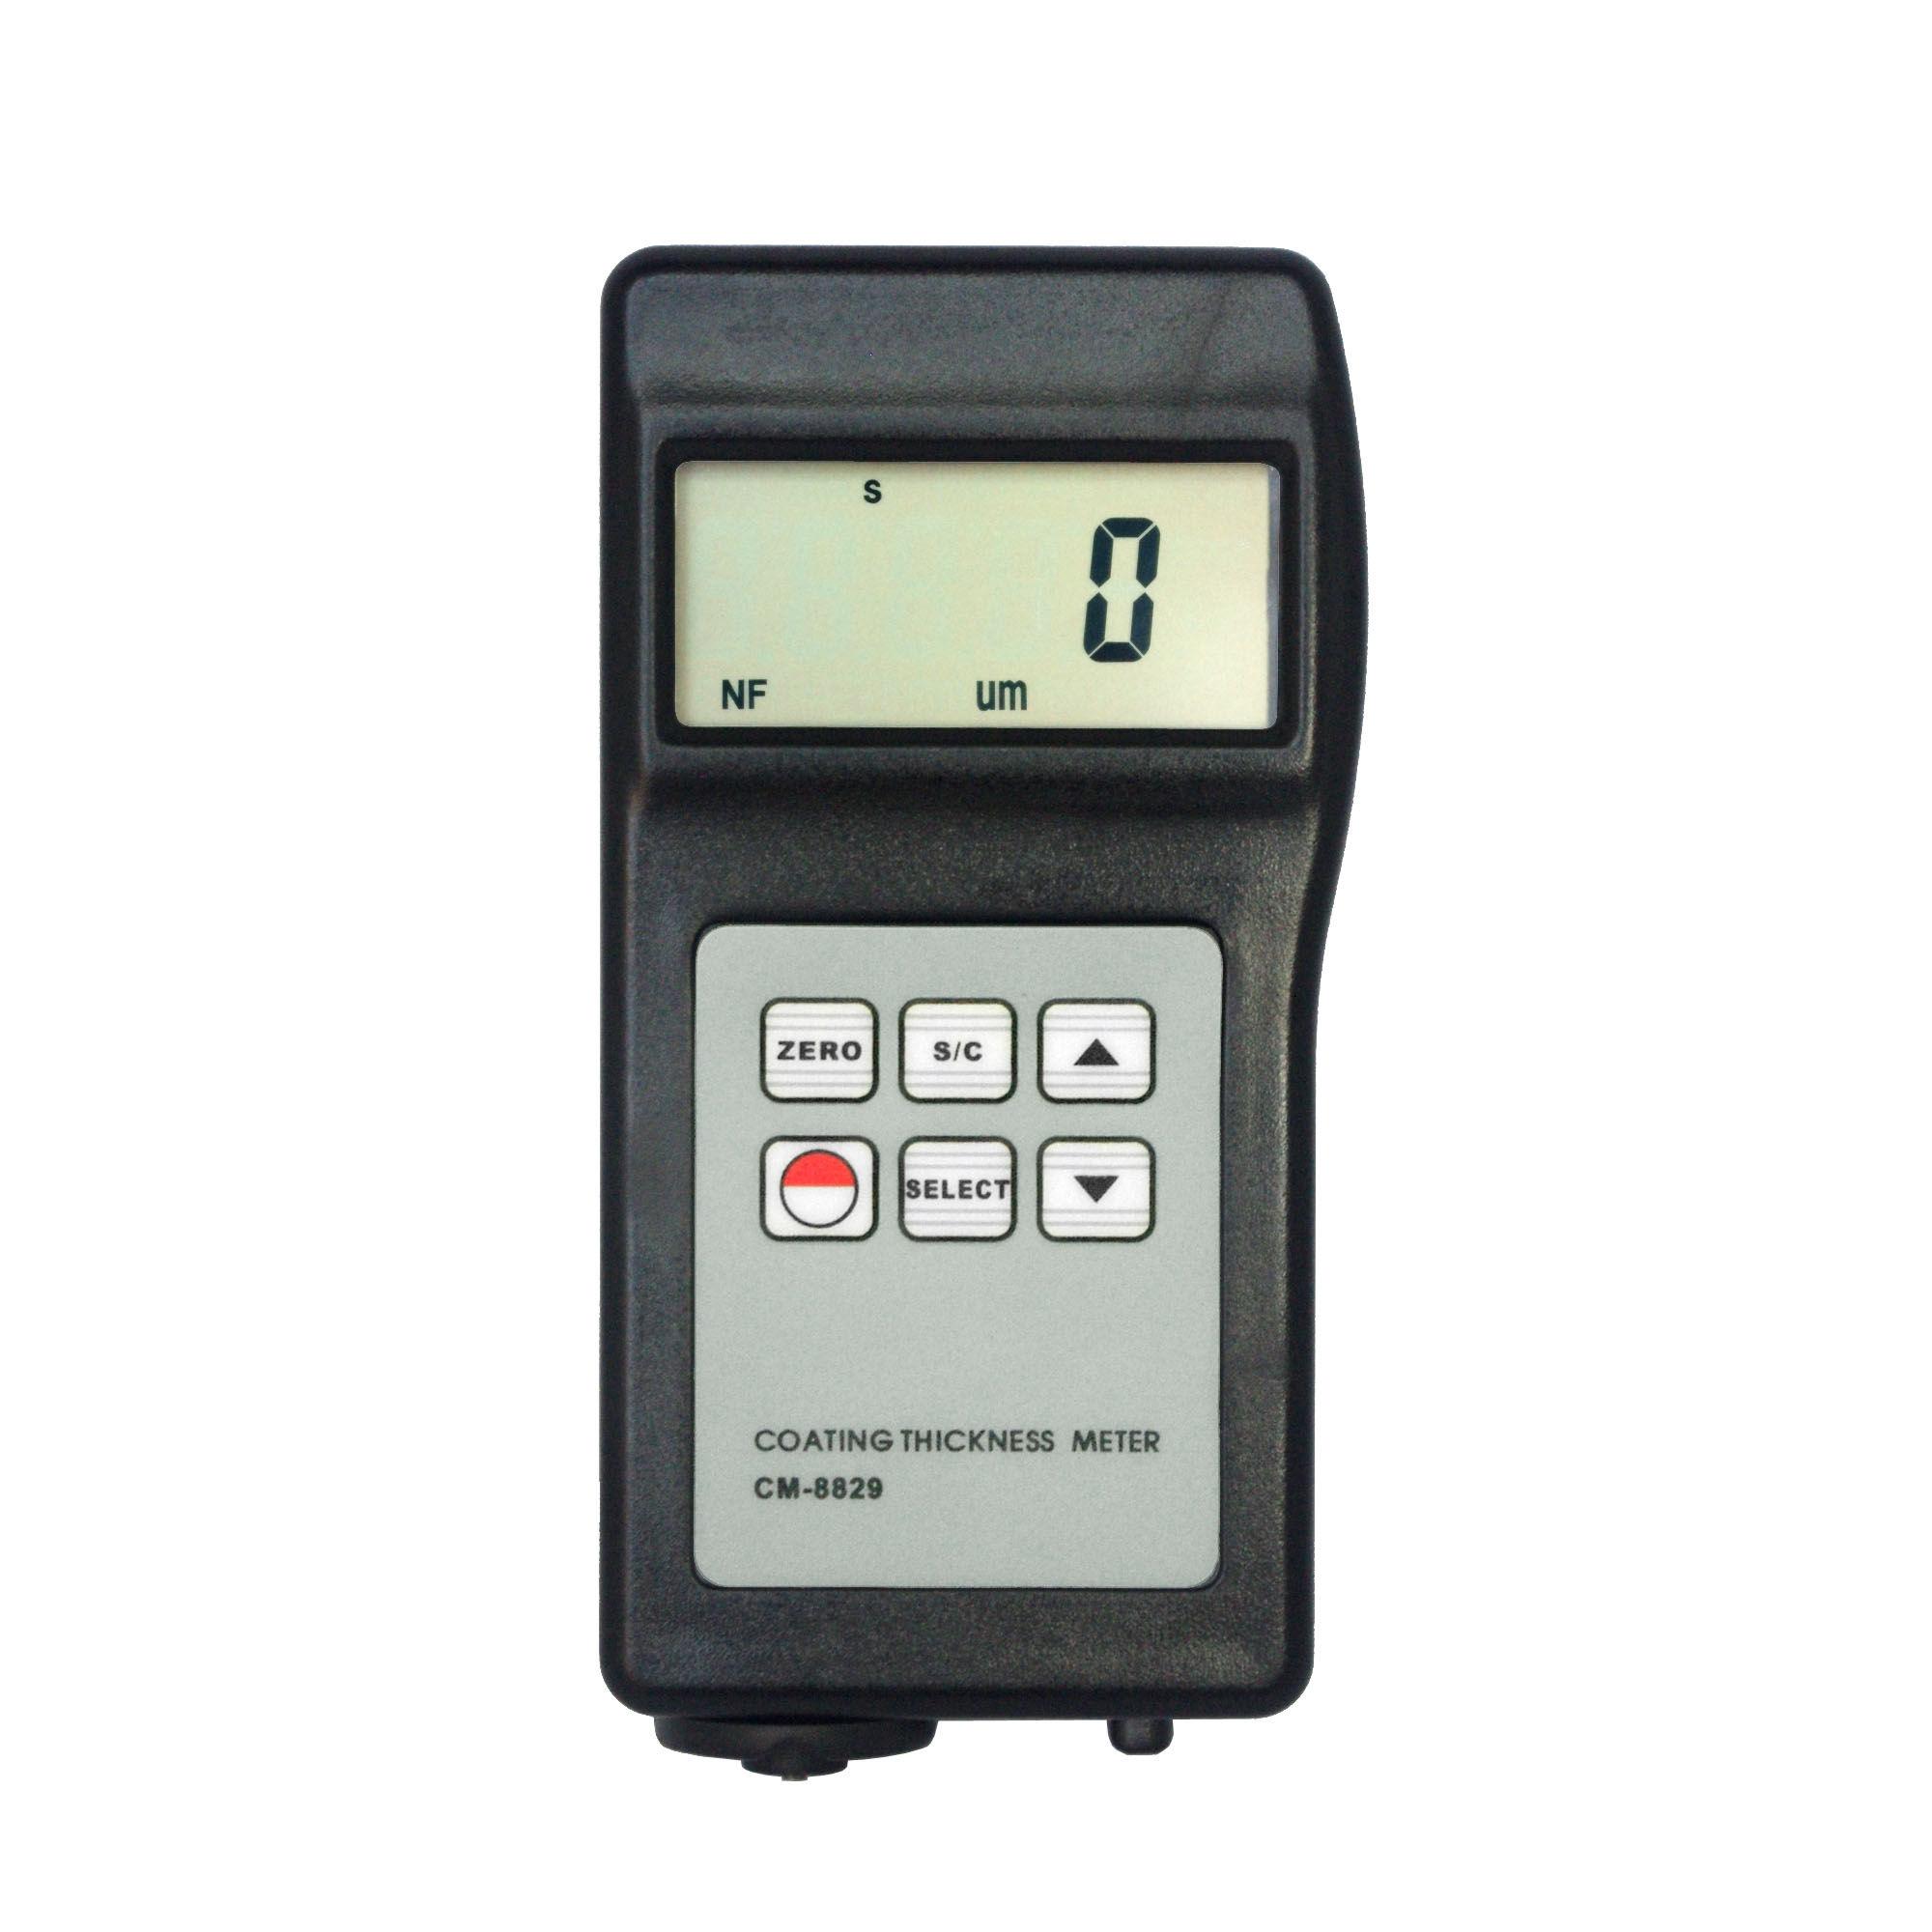 LONGJUAN-C Measurement Measuring Tester 20 Pipe Scanner Thickness Gauge Pipeline Blockage Blocking Clogging Finder Plumbers Width Measure Instrument Digital Meter Test Tool Thickness Gauge